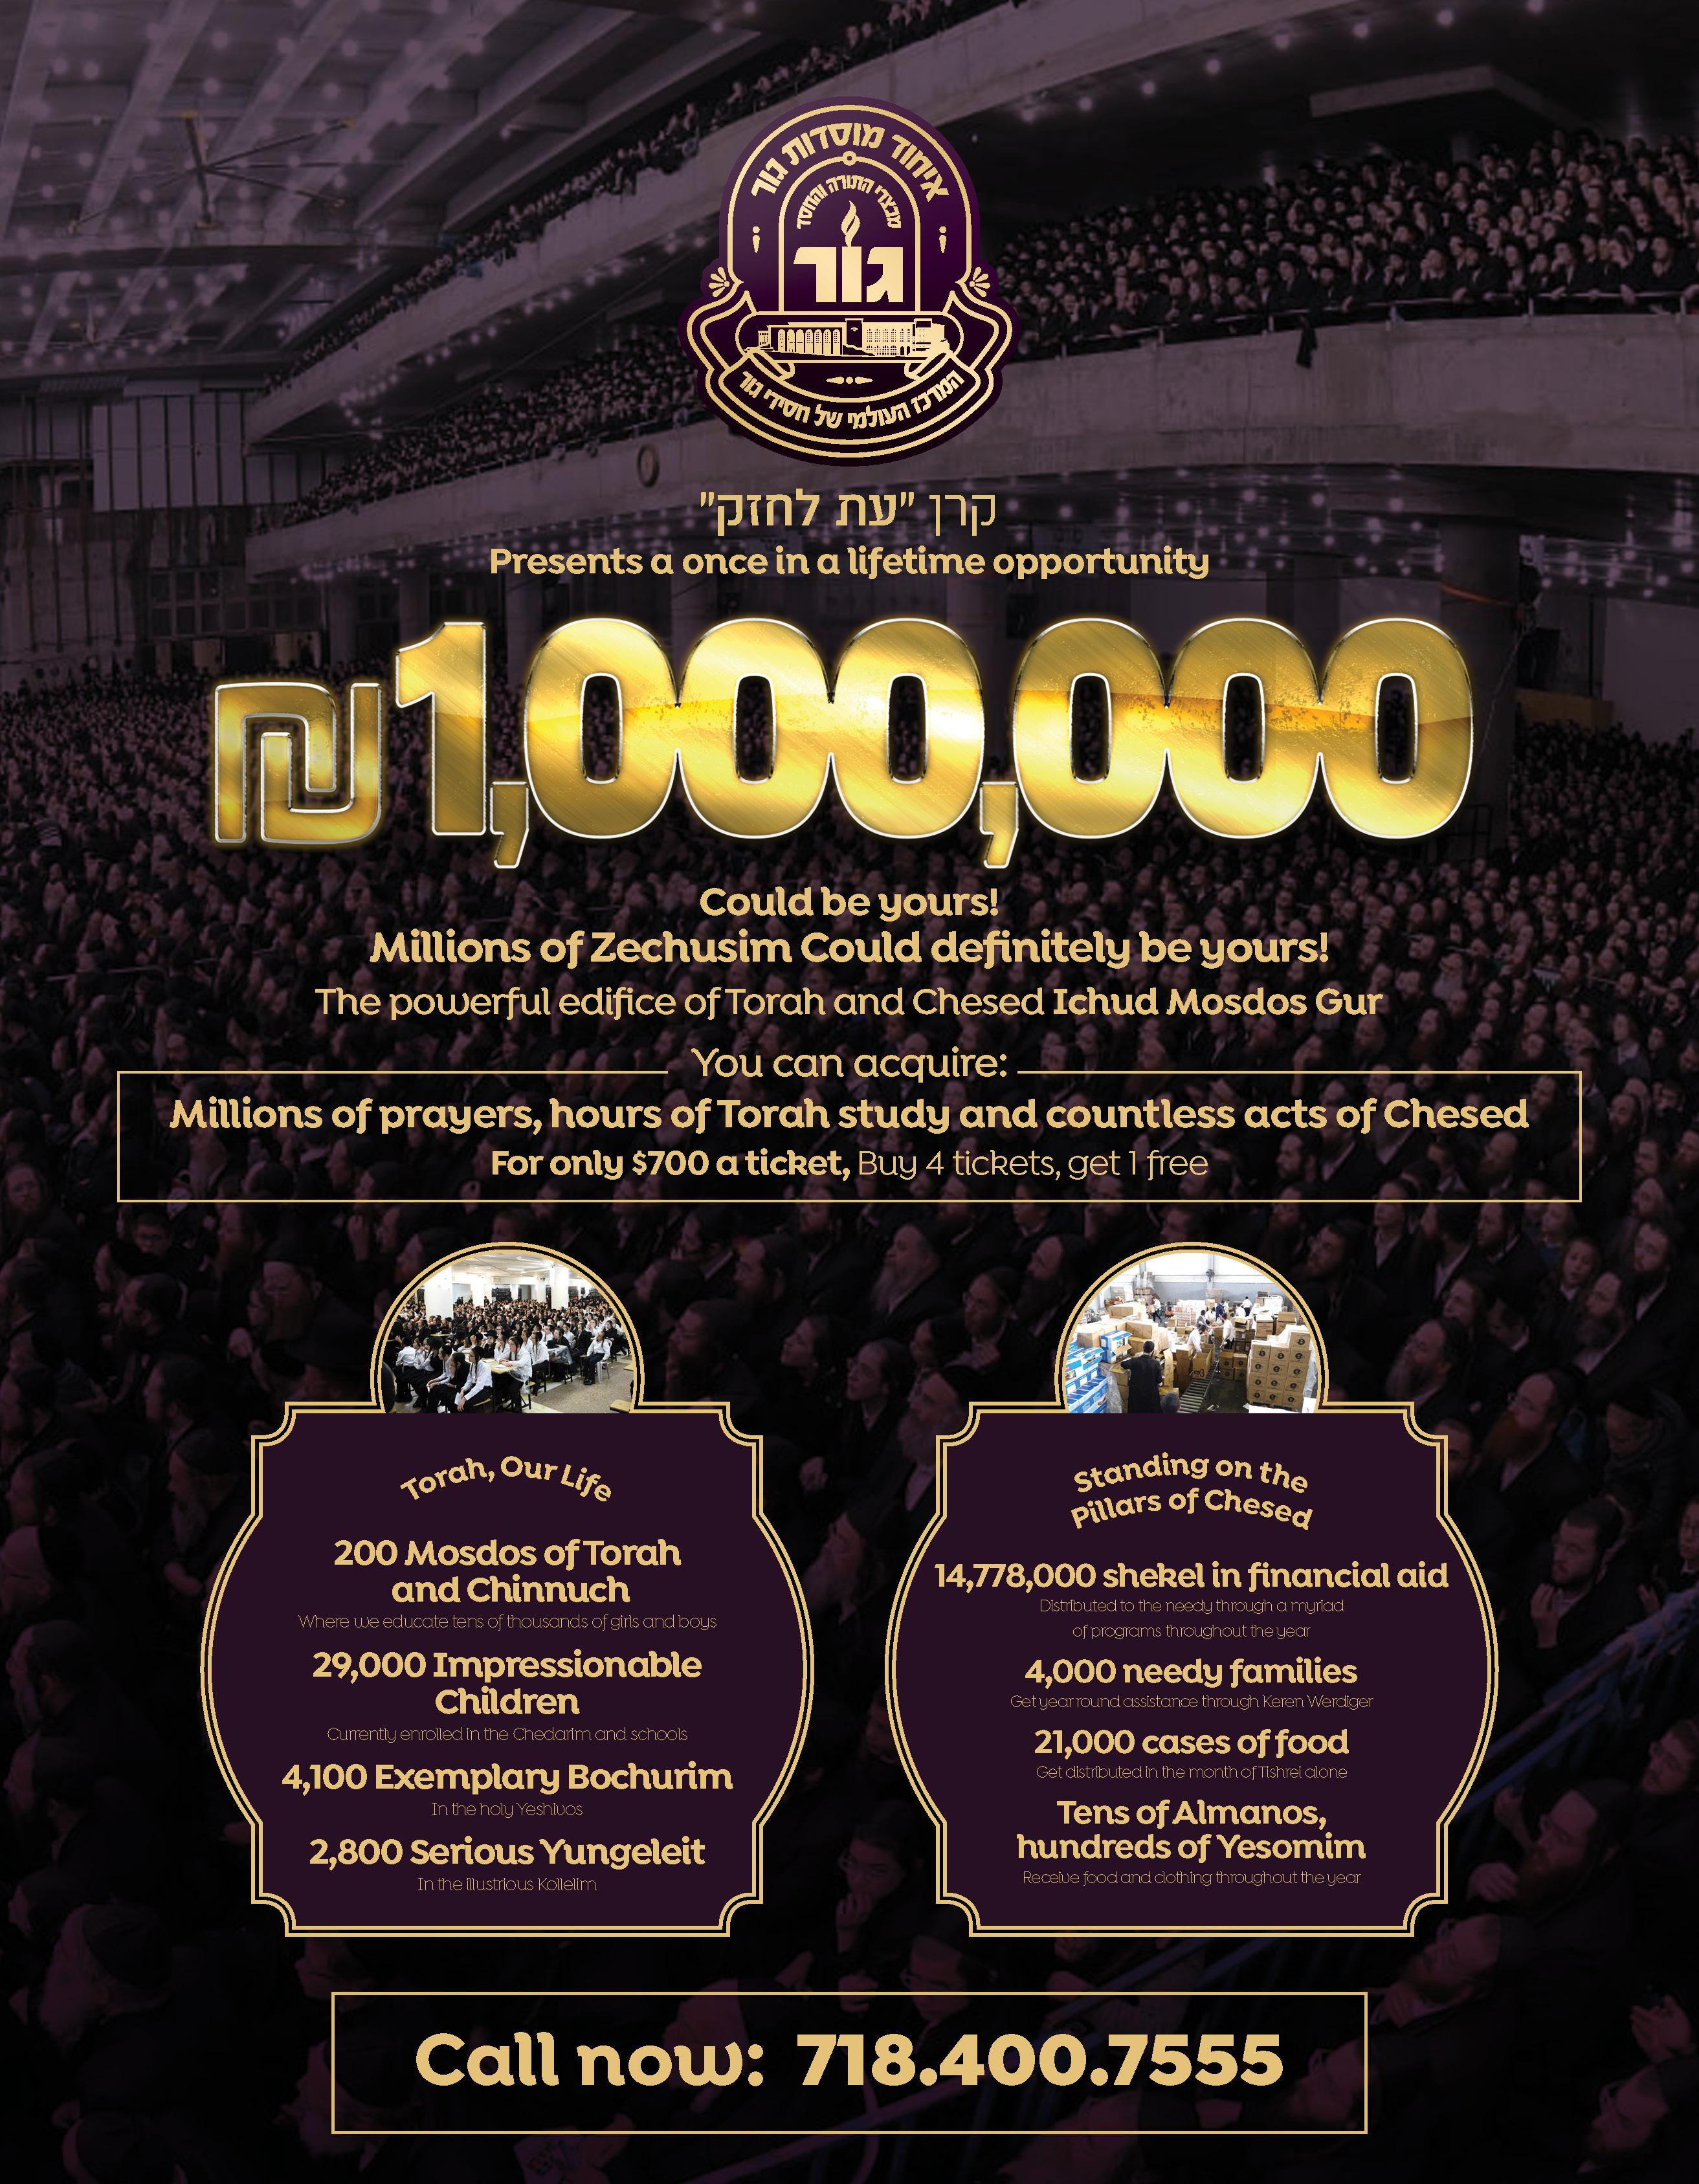 A Million Shekel and Countless Zechusim